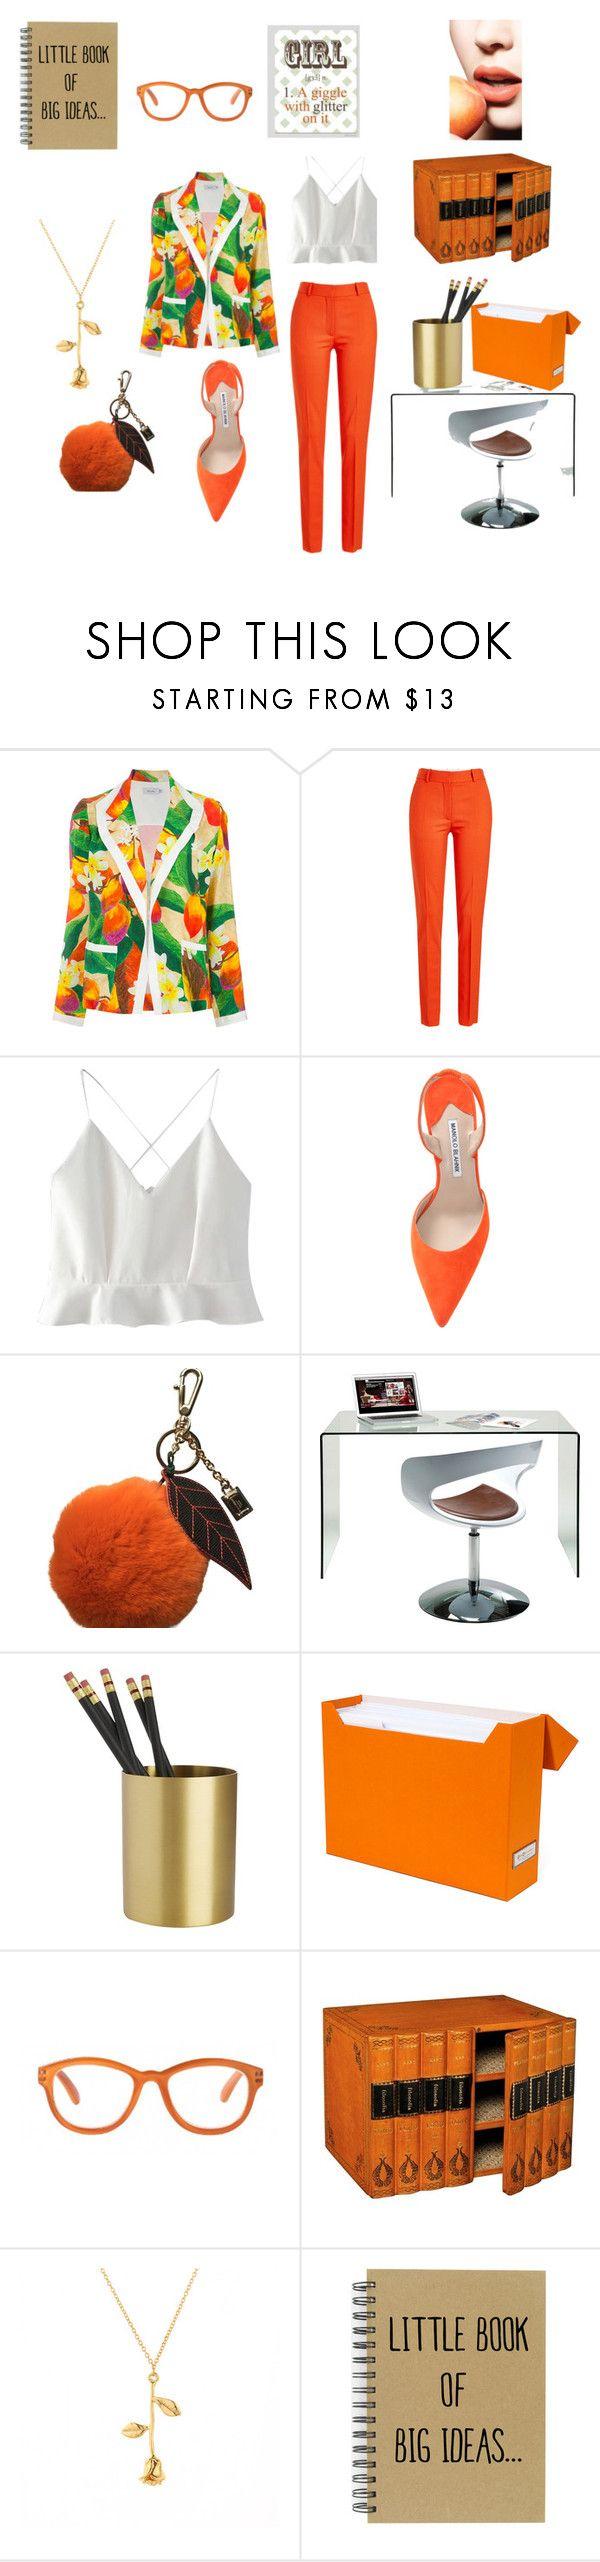 """Orange formal attire"" by miloni-jhaveri on Polyvore featuring Isolda, Victoria Beckham, WithChic, Manolo Blahnik, Dolce&Gabbana, Bigso and WALL"